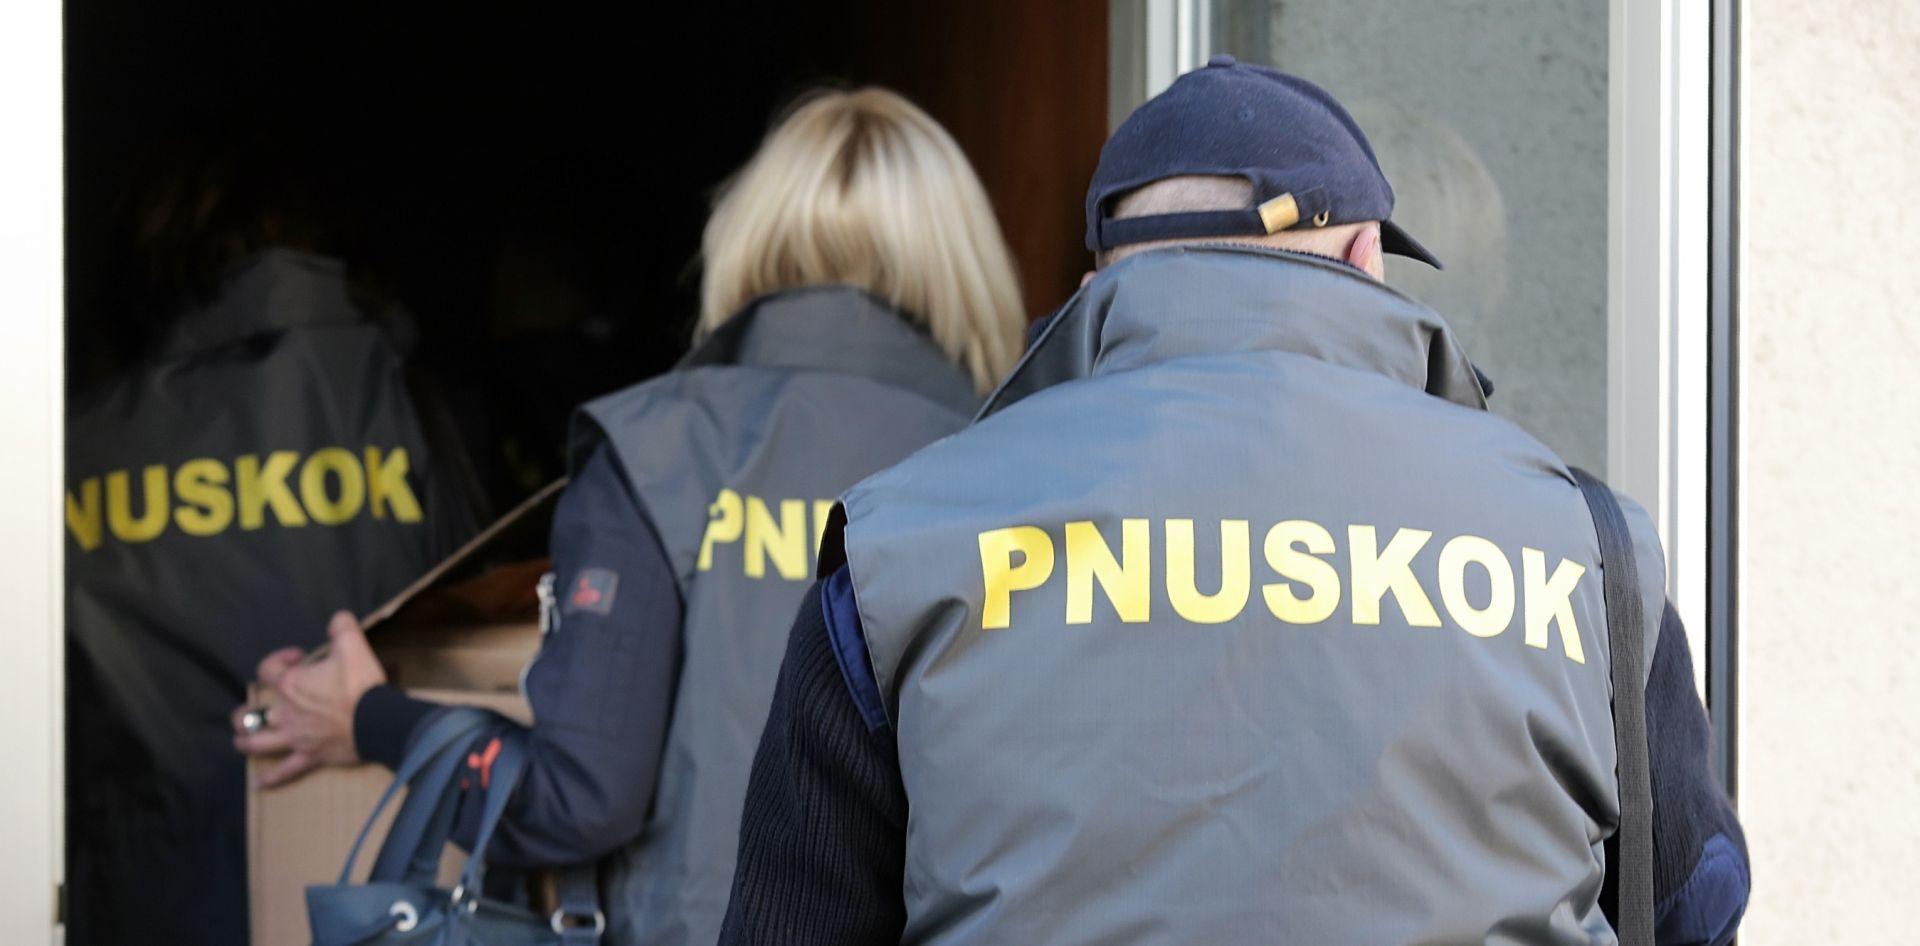 PODIGNUTA OPTUŽNICA: Voditeljica banke osumnjičena da je dojavila Mamiću za USKOK